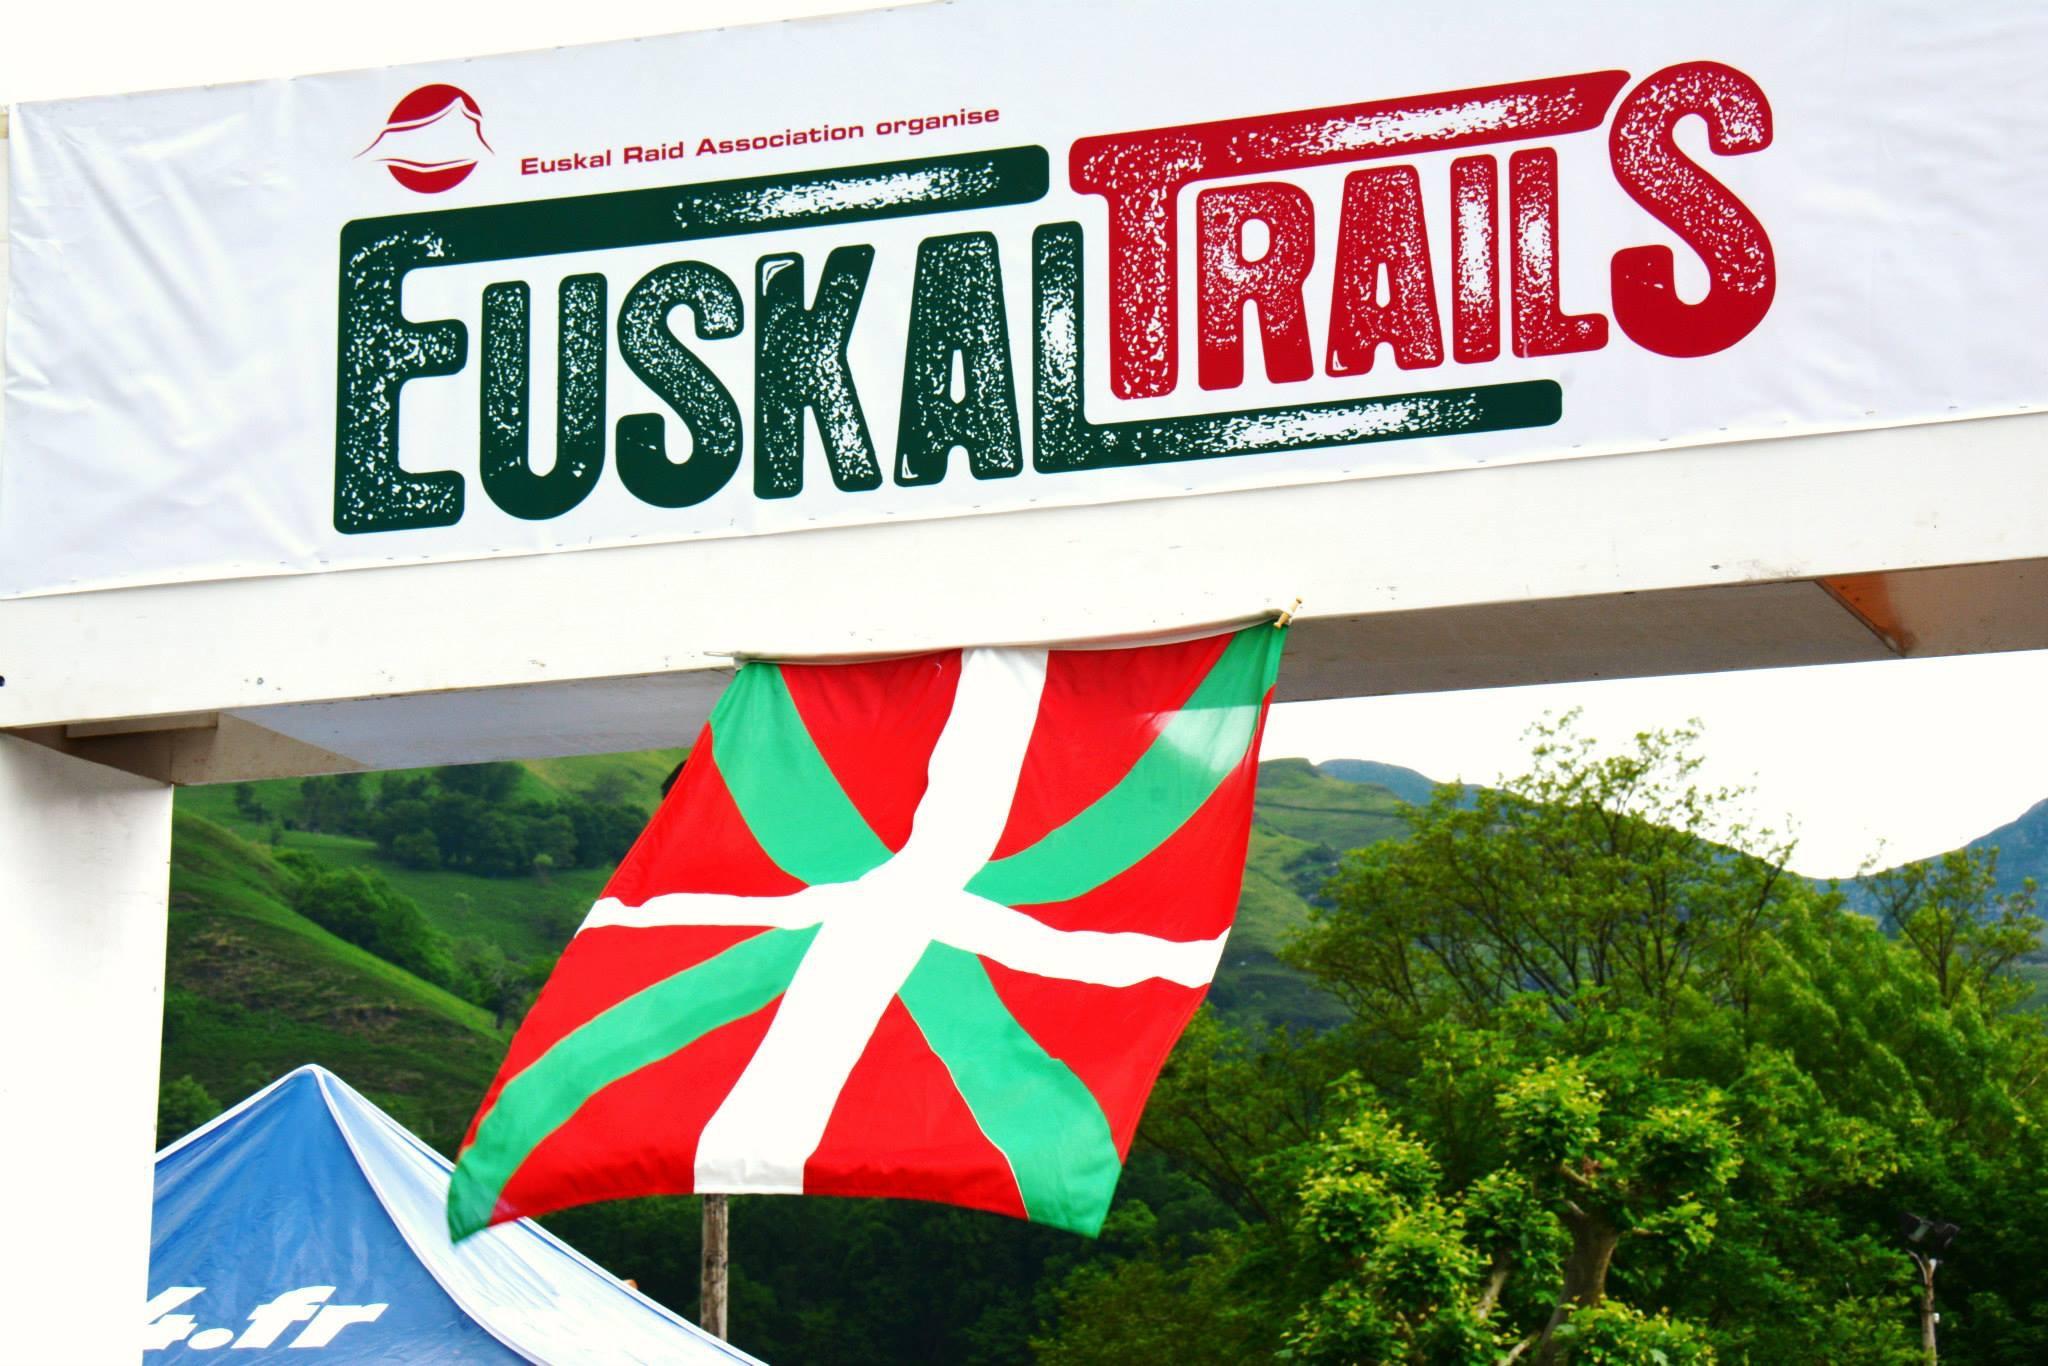 RESULTATS 2016 EUSKAL TRAIL